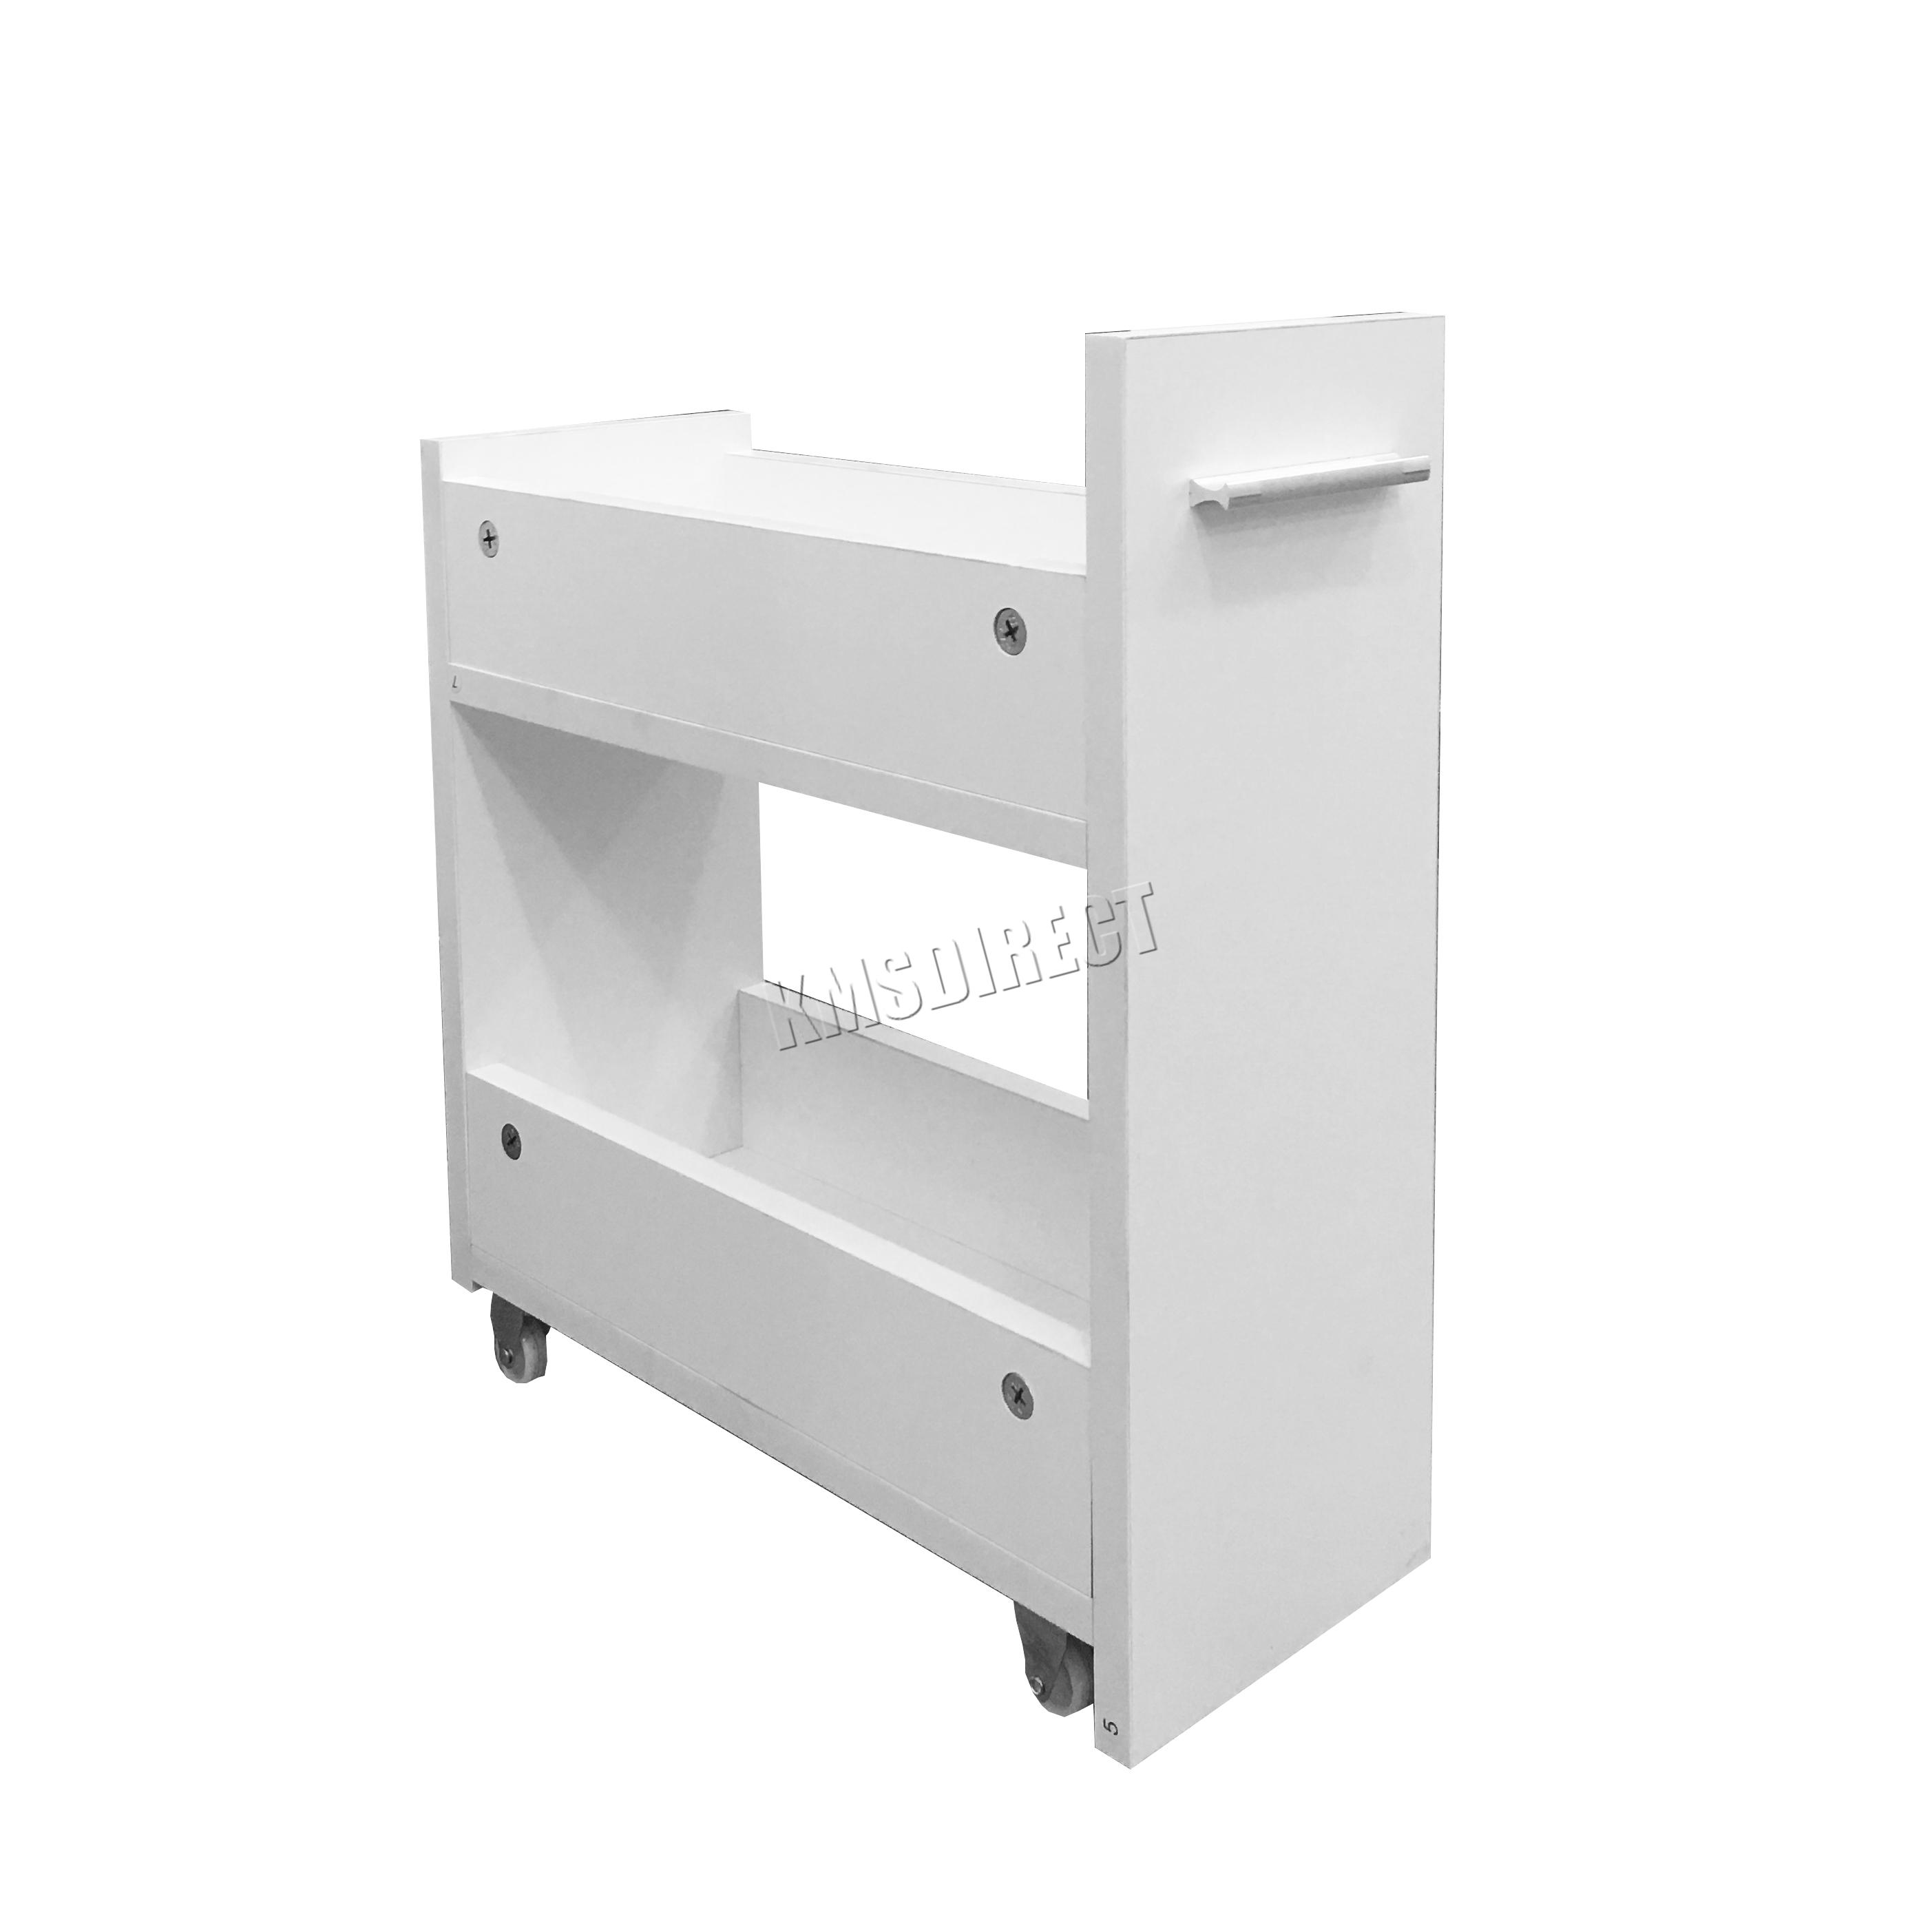 Sentinel Foxhunter Bathroom Kitchen Slide Out Storage Drawer Cabinet Slim  Cupboard Unit